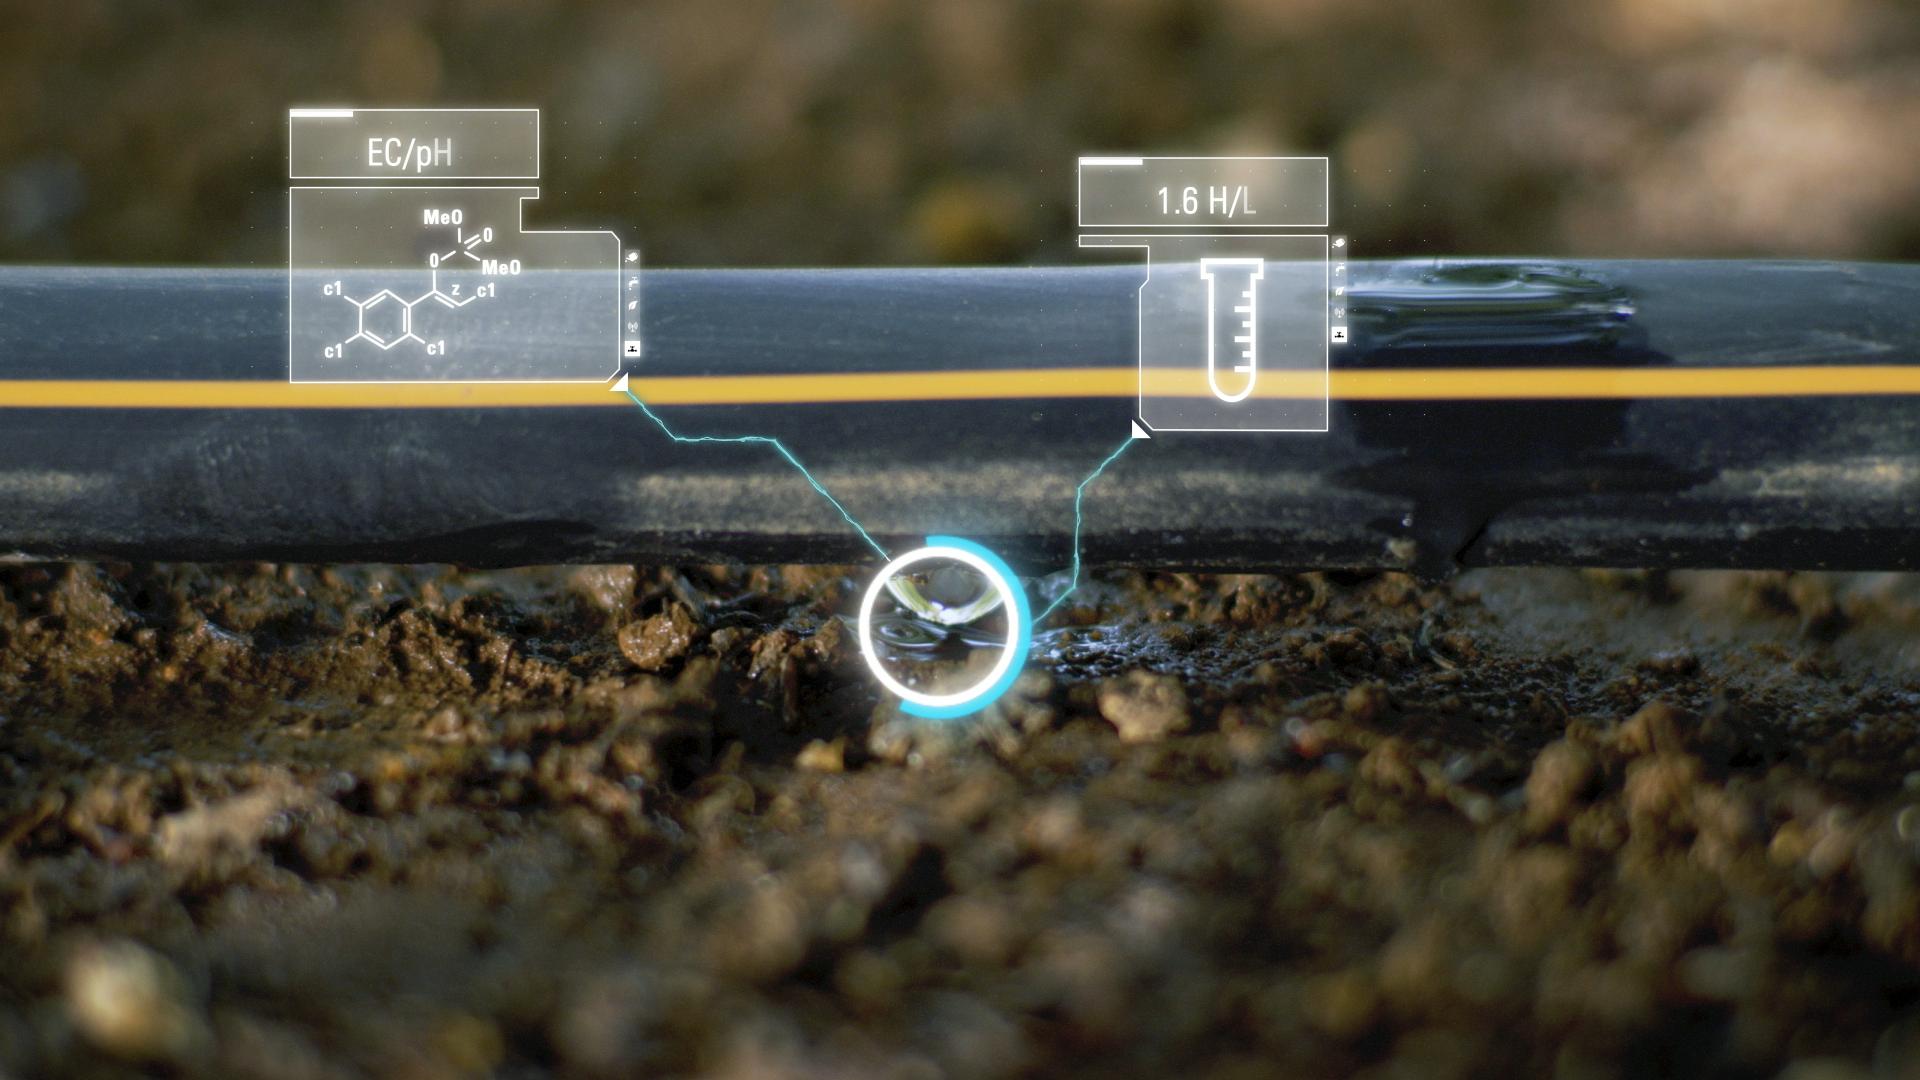 Irrigation system sensors